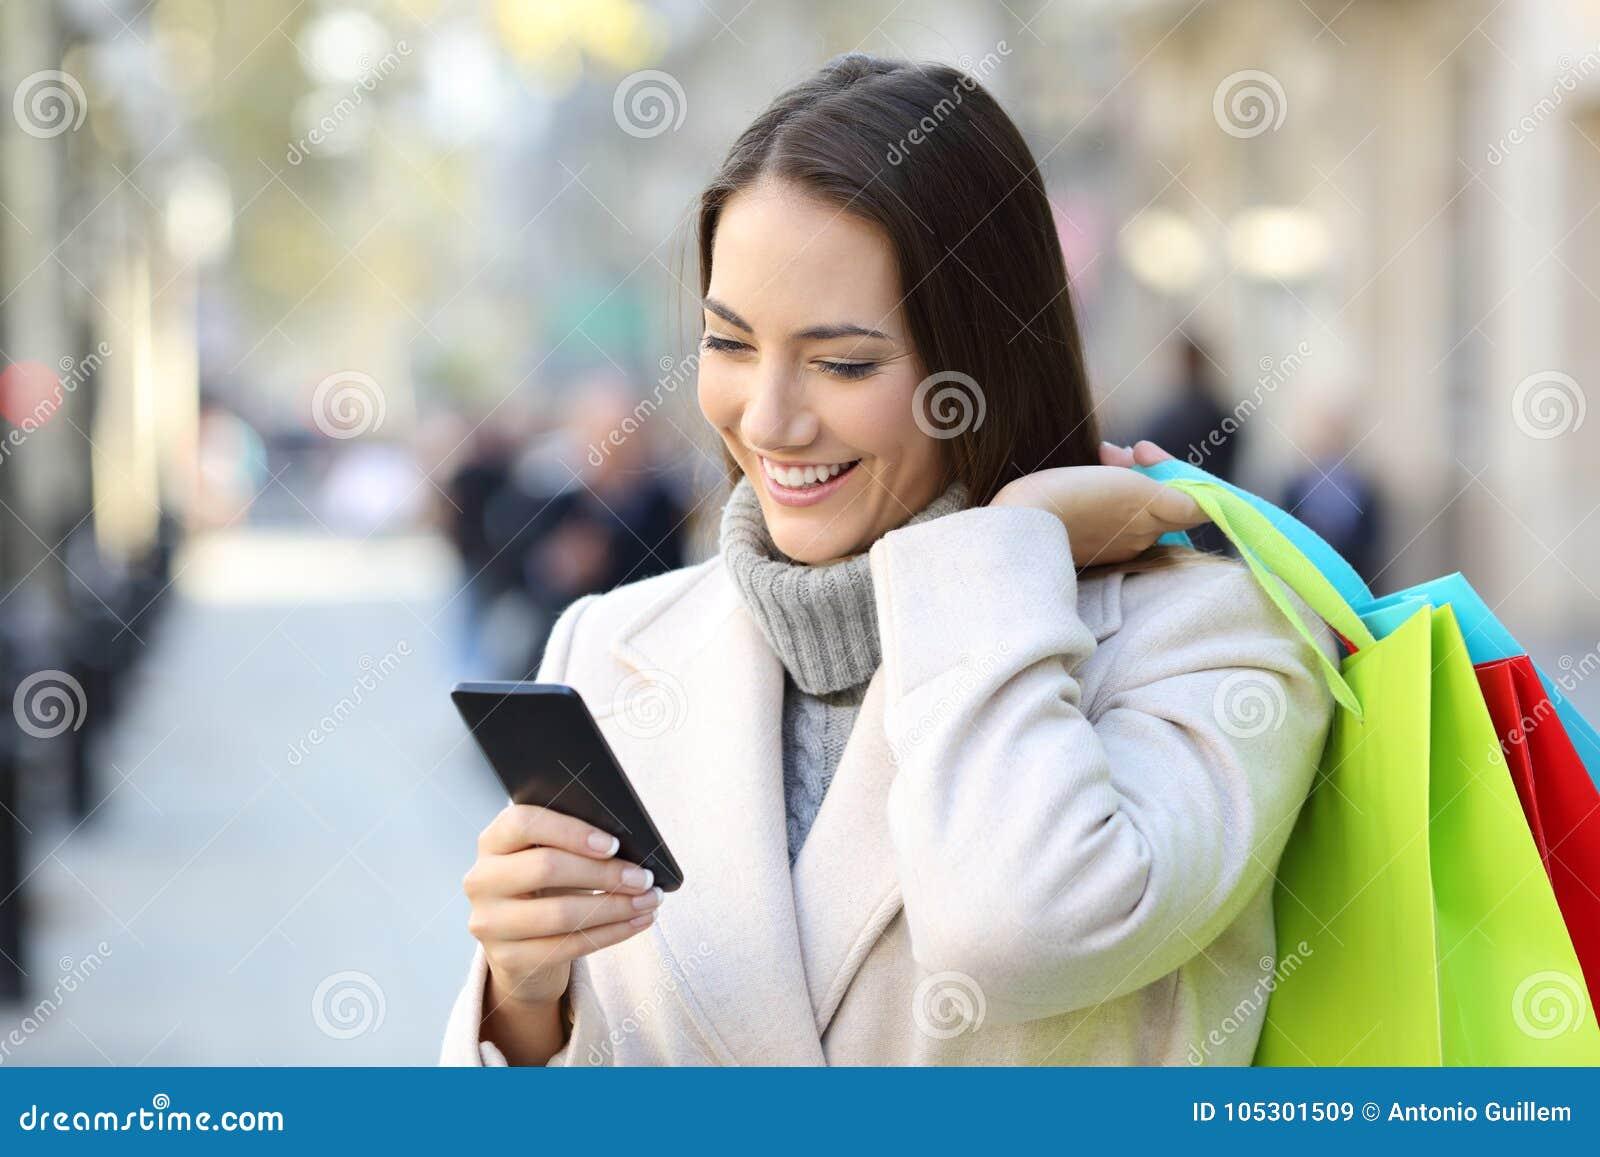 Be a Smart Phone Shopper advise